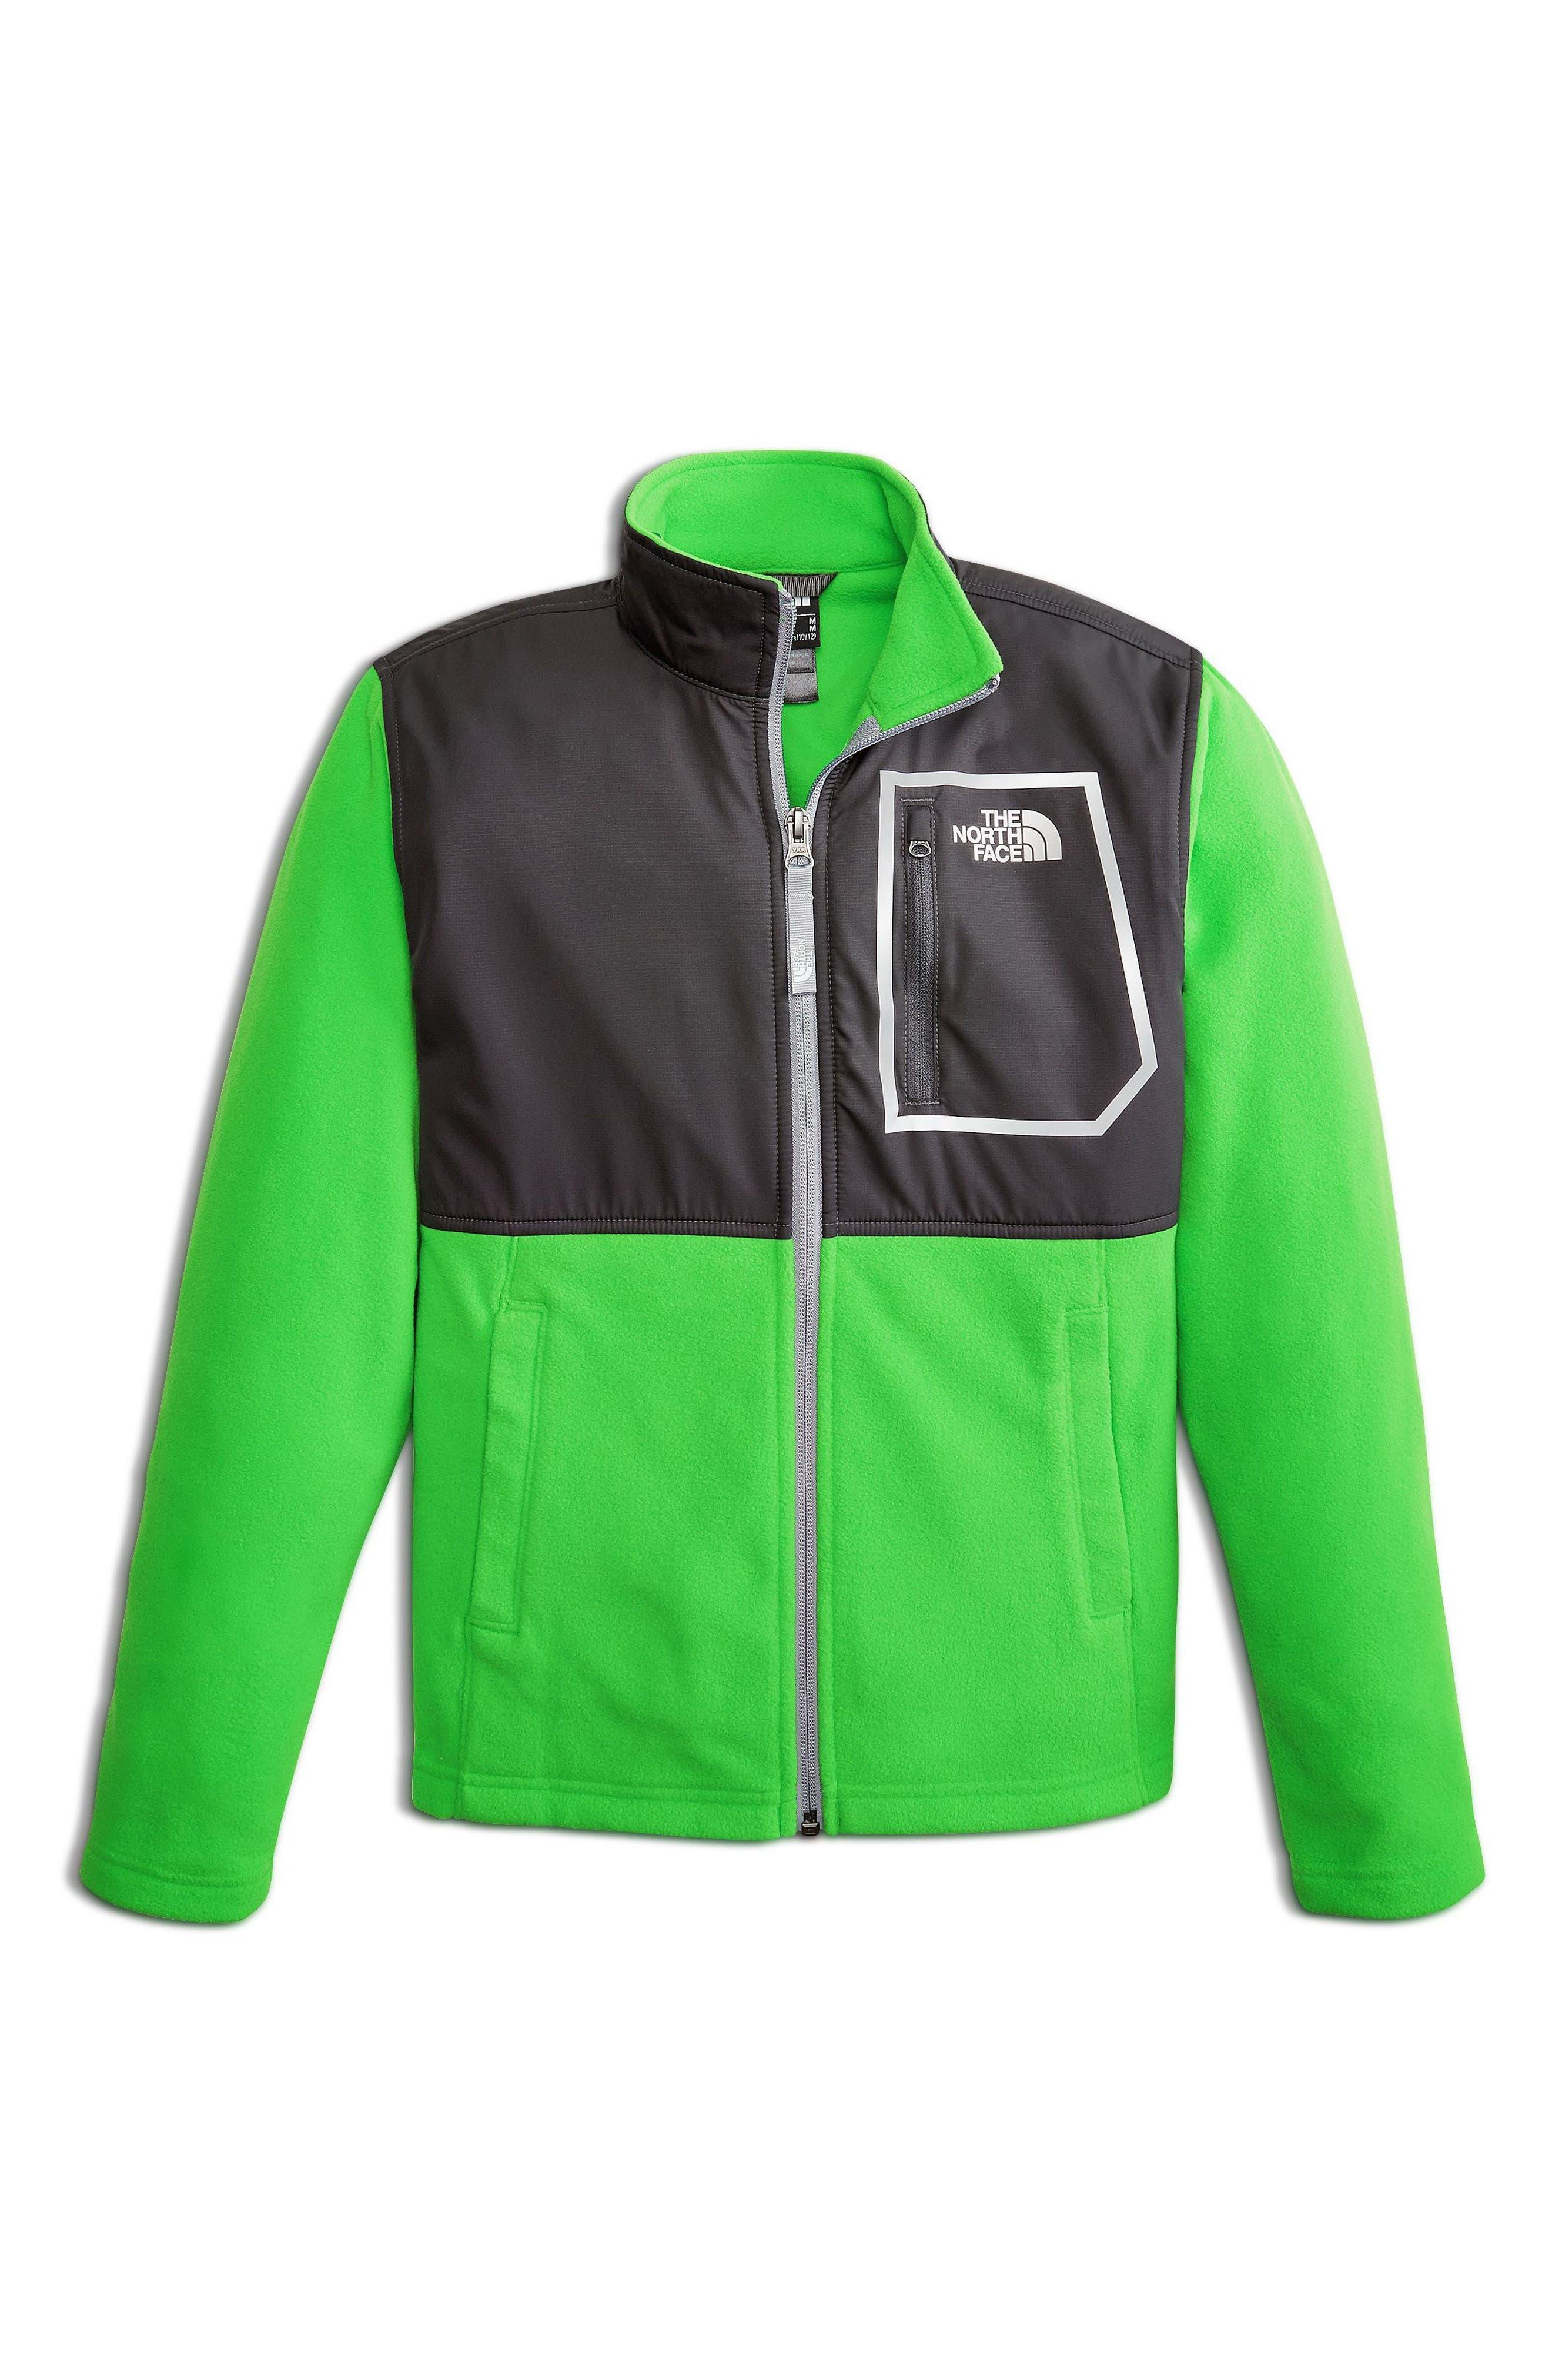 THE NORTH FACE, Glacier Track Jacket, Main thumbnail 1, color, CLASSIC GREEN